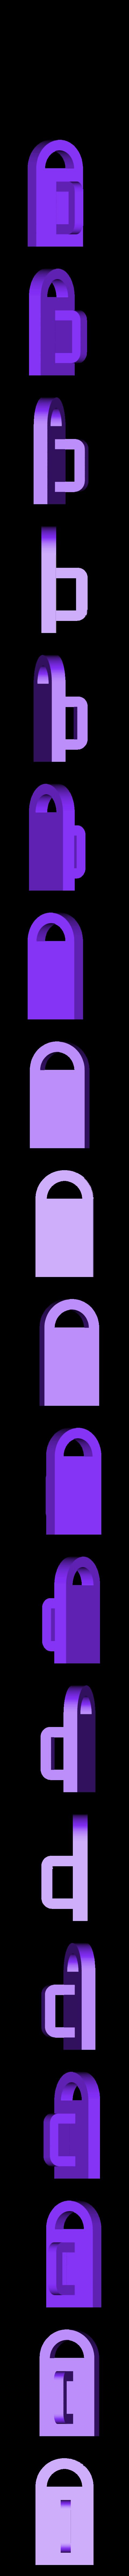 VL_Attach_PRINTx2.stl Download free STL file Viking Chest Lock • 3D printer object, Snorri